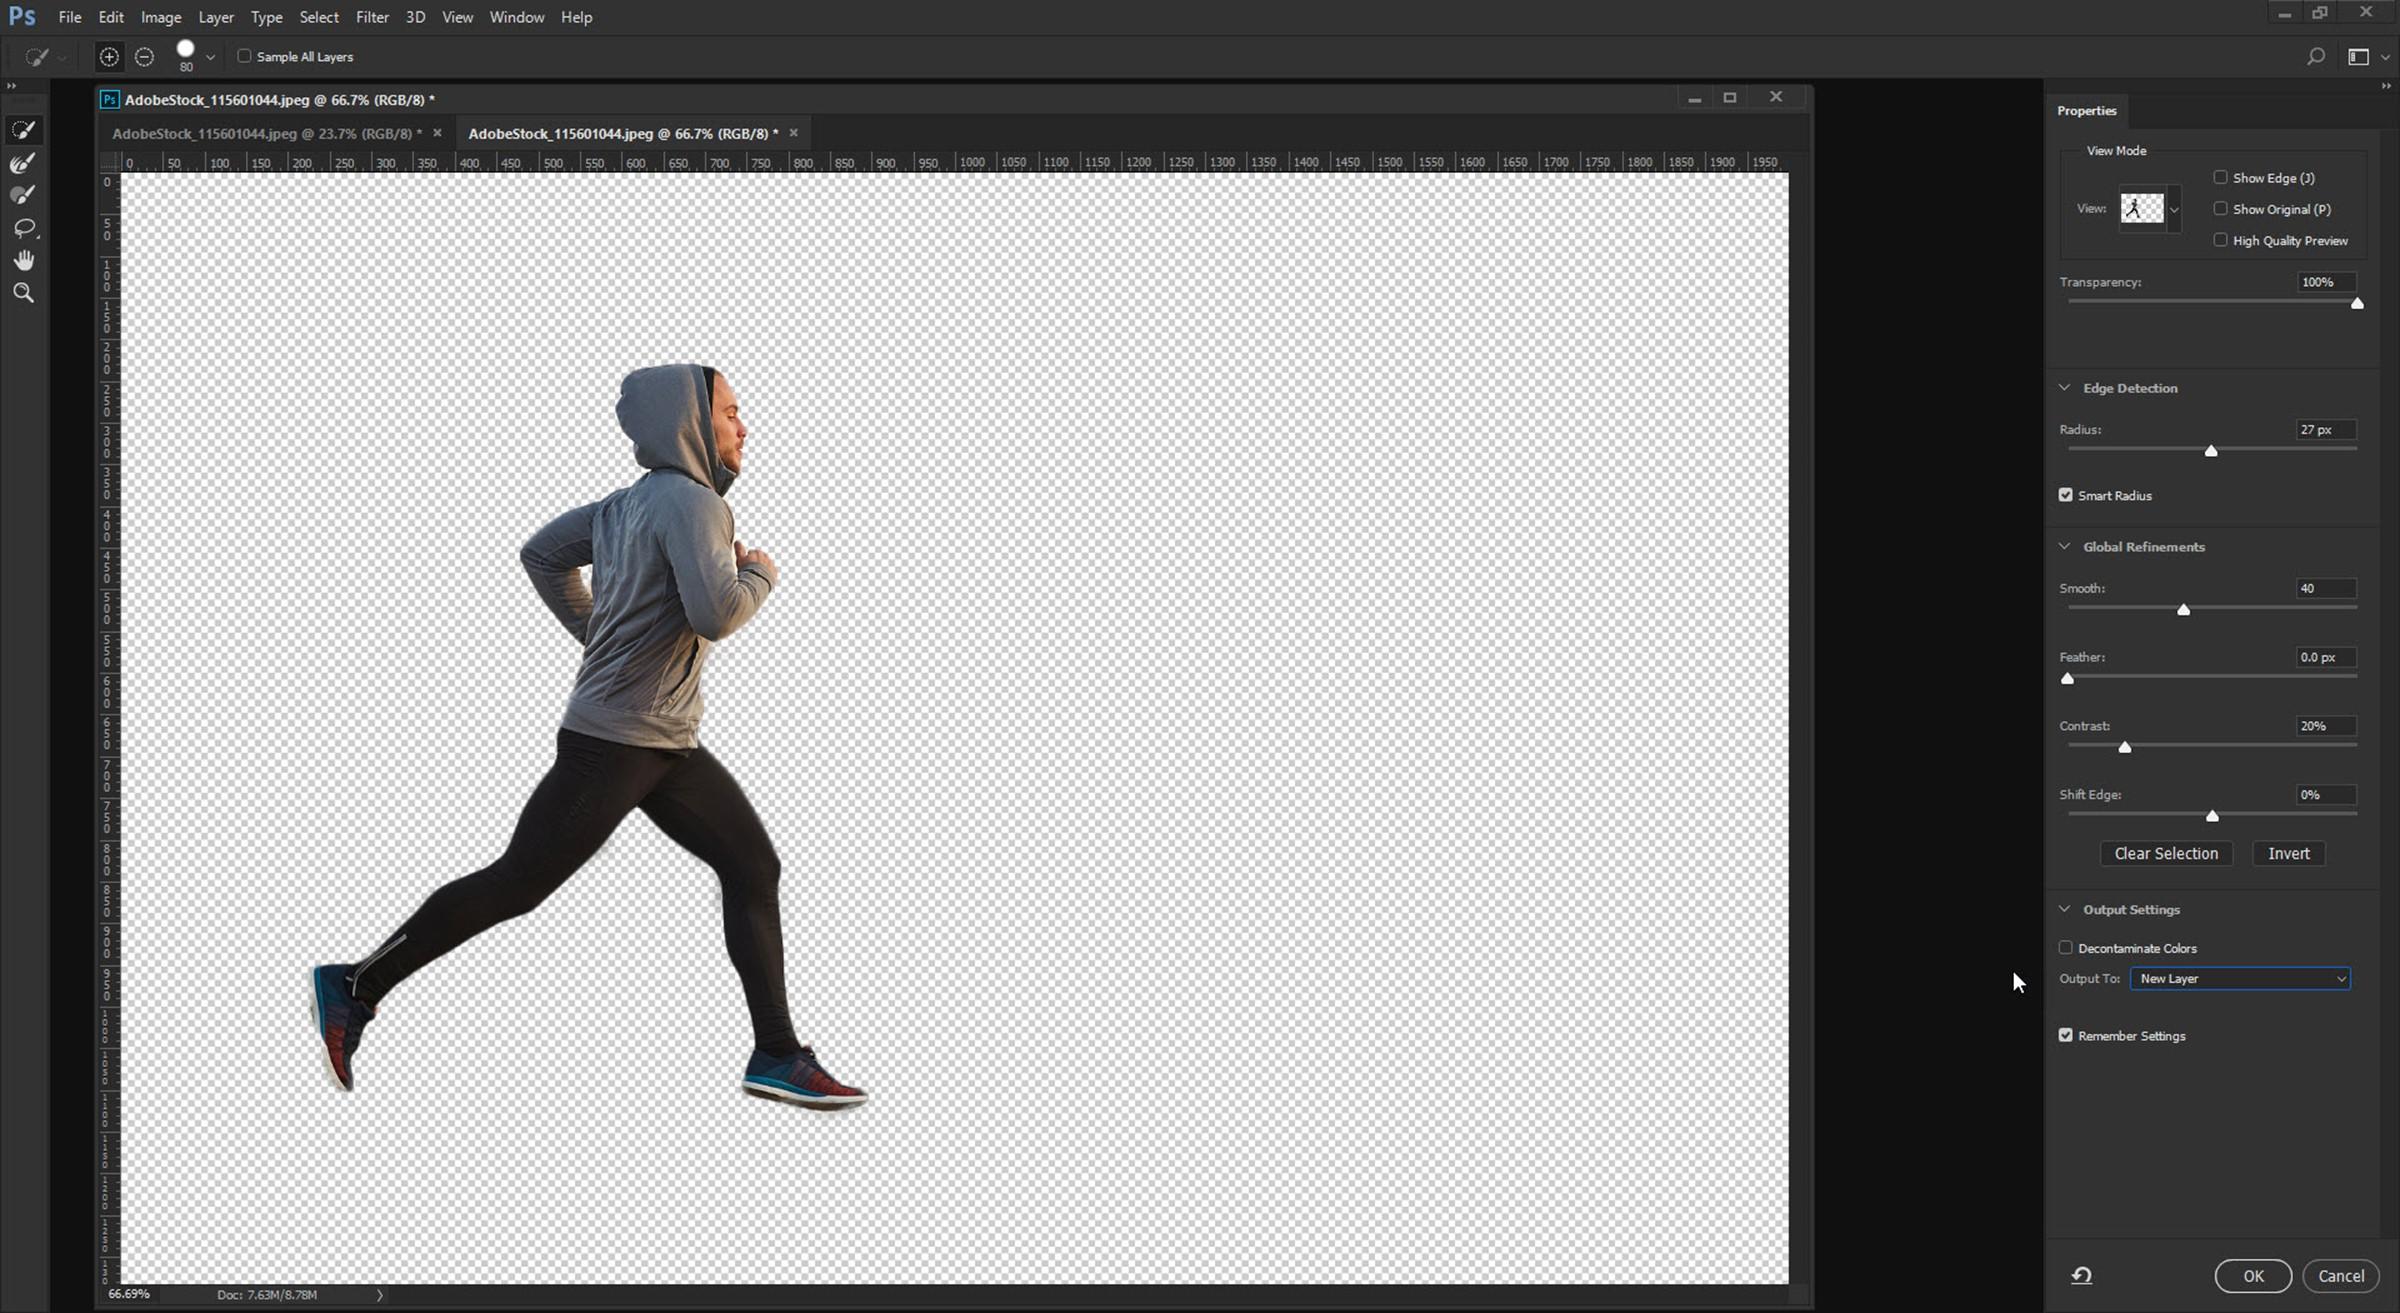 092417_1152_CreateMotio4 - Create Motion Blur in Photoshop